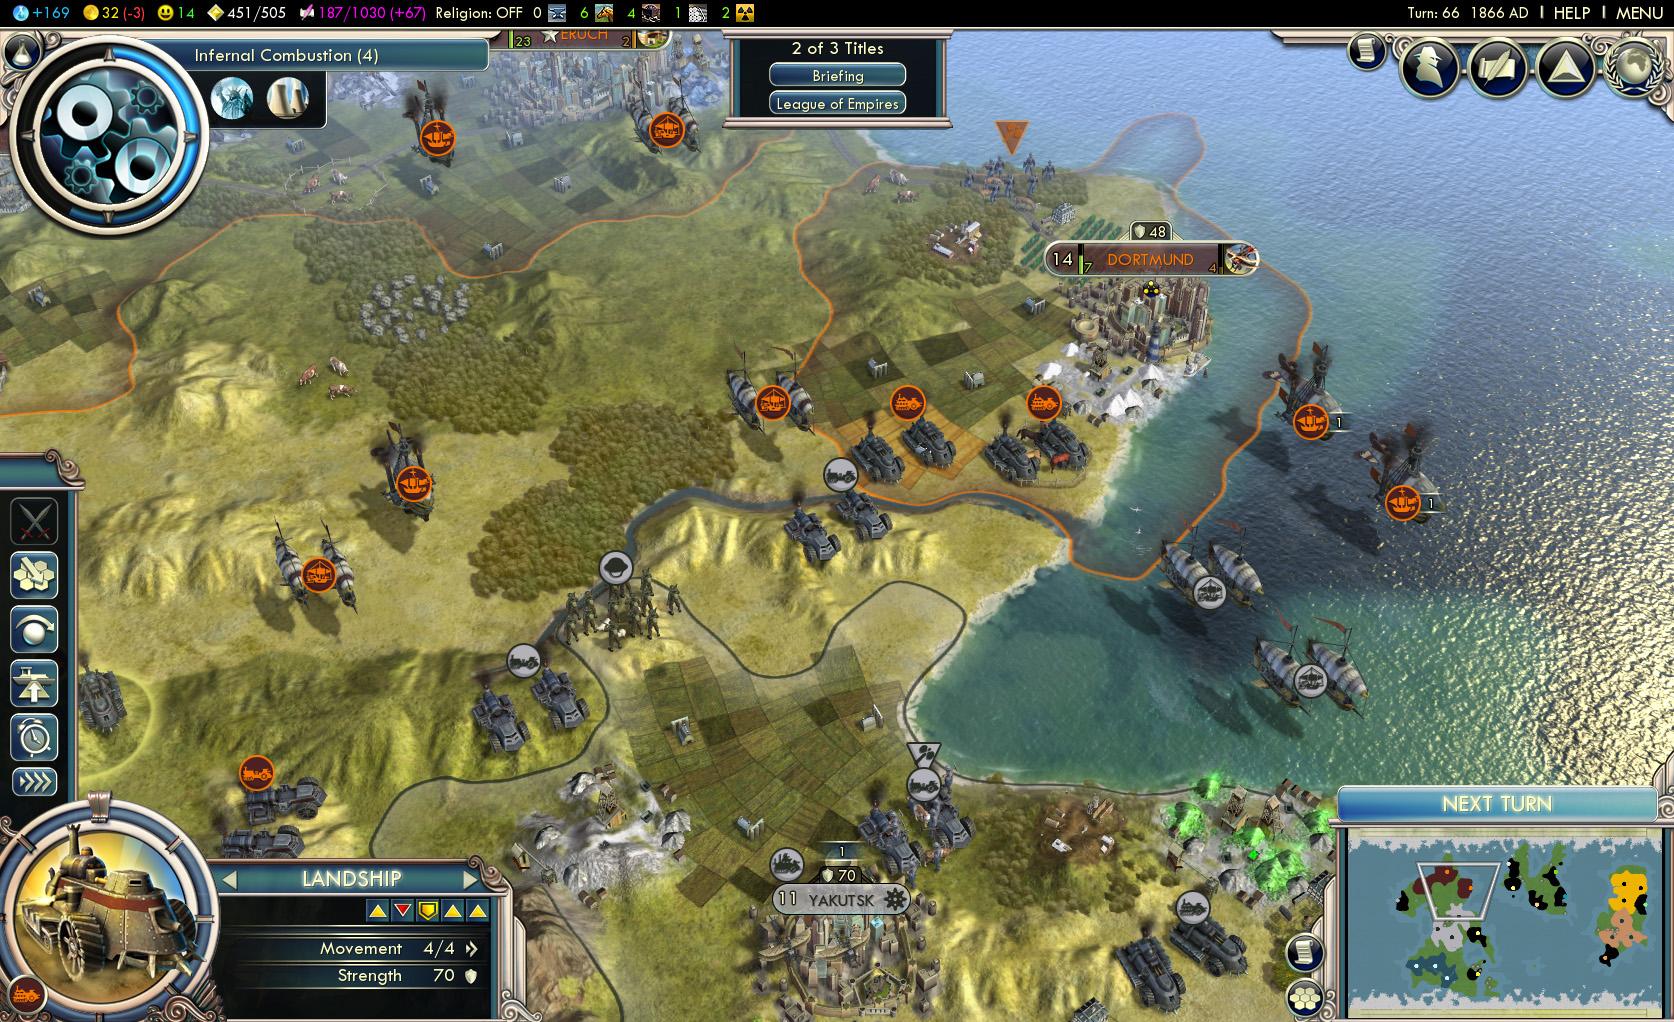 Empires of the Smoky Skies (Civ5) | Civilization Wiki